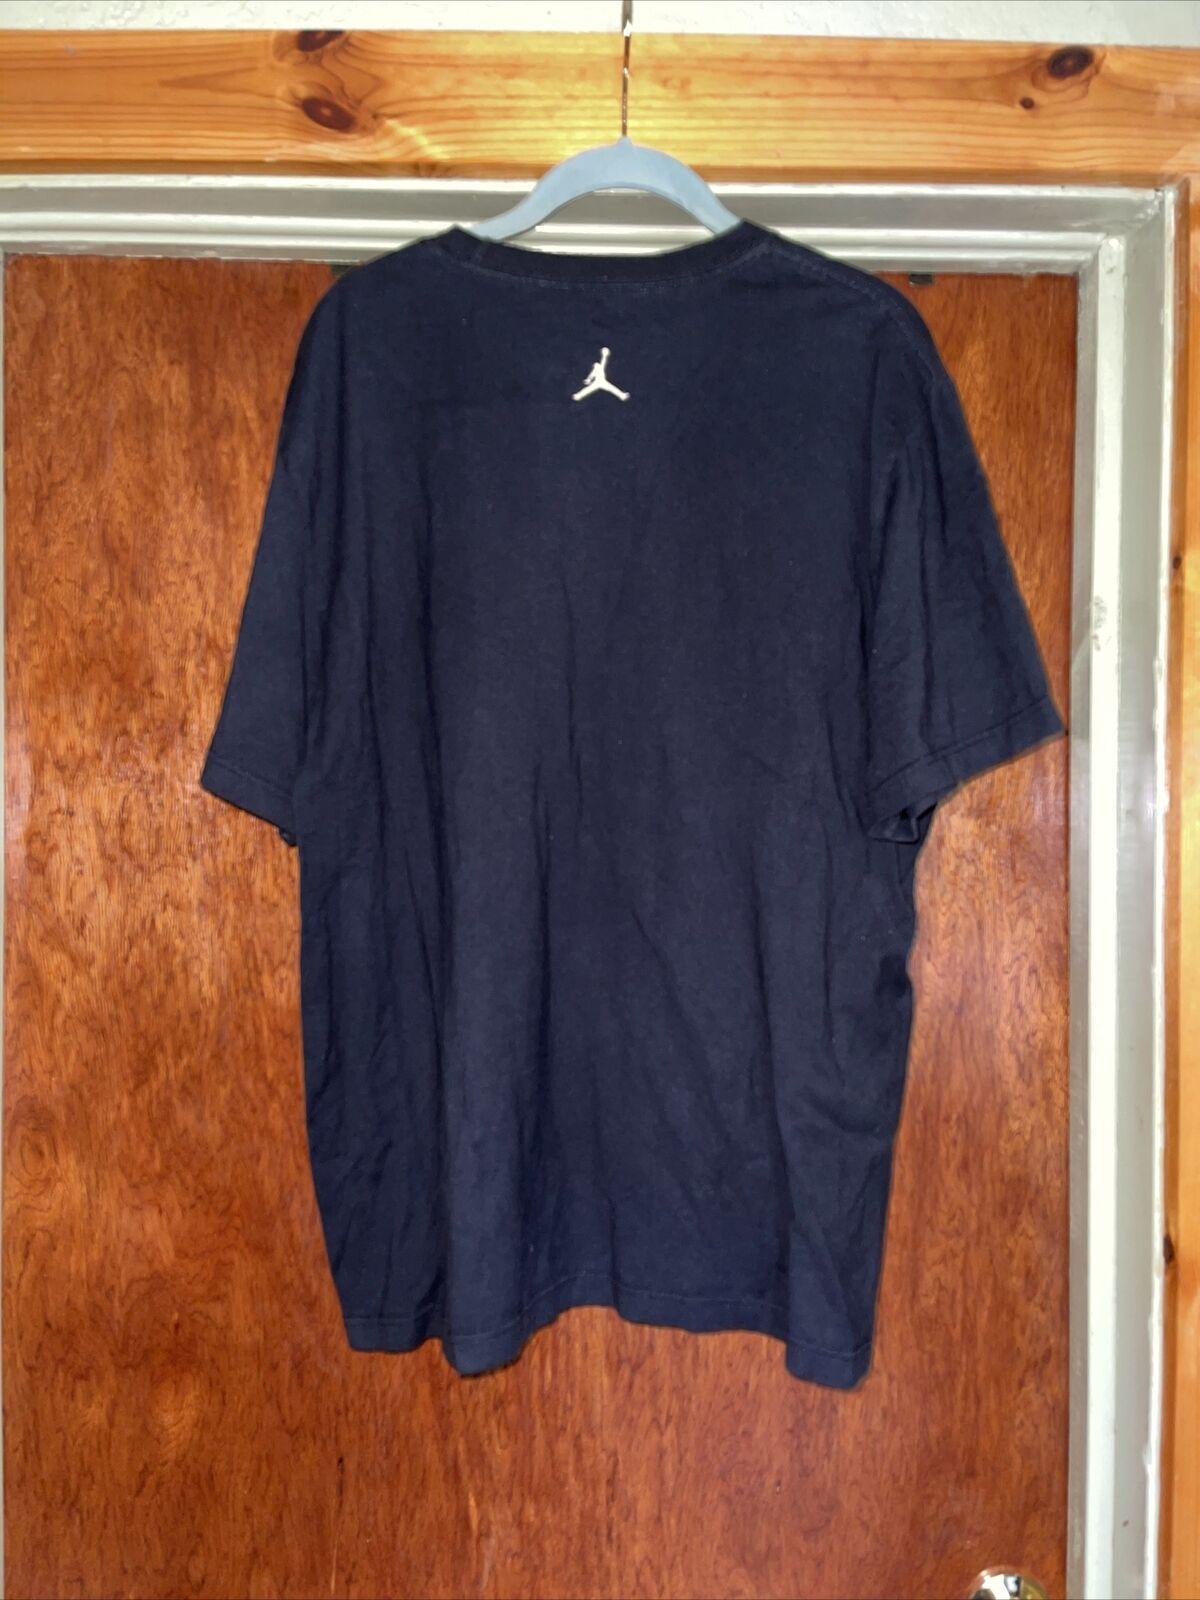 Lot Of 3 Jordan Retro 3 T-shirt Tee Shirts Men Si… - image 4